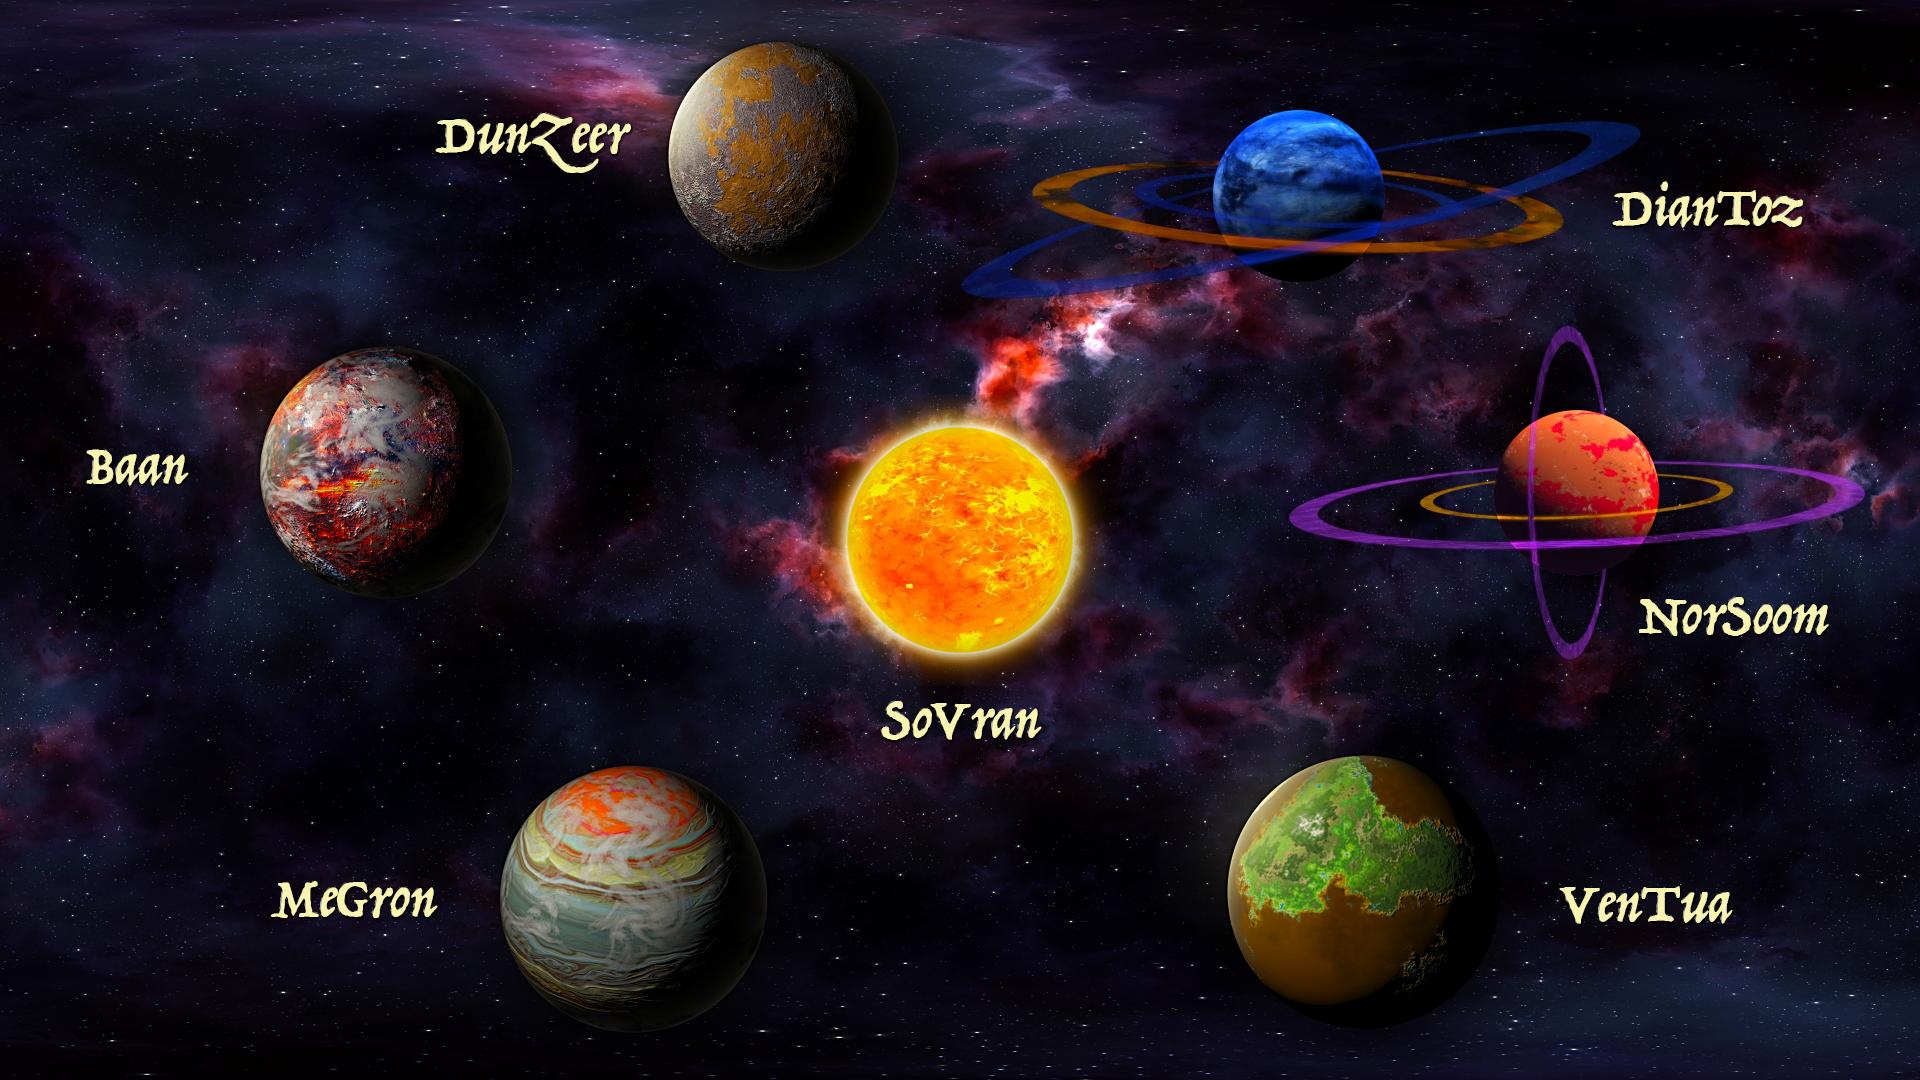 DianToz Interactive Map